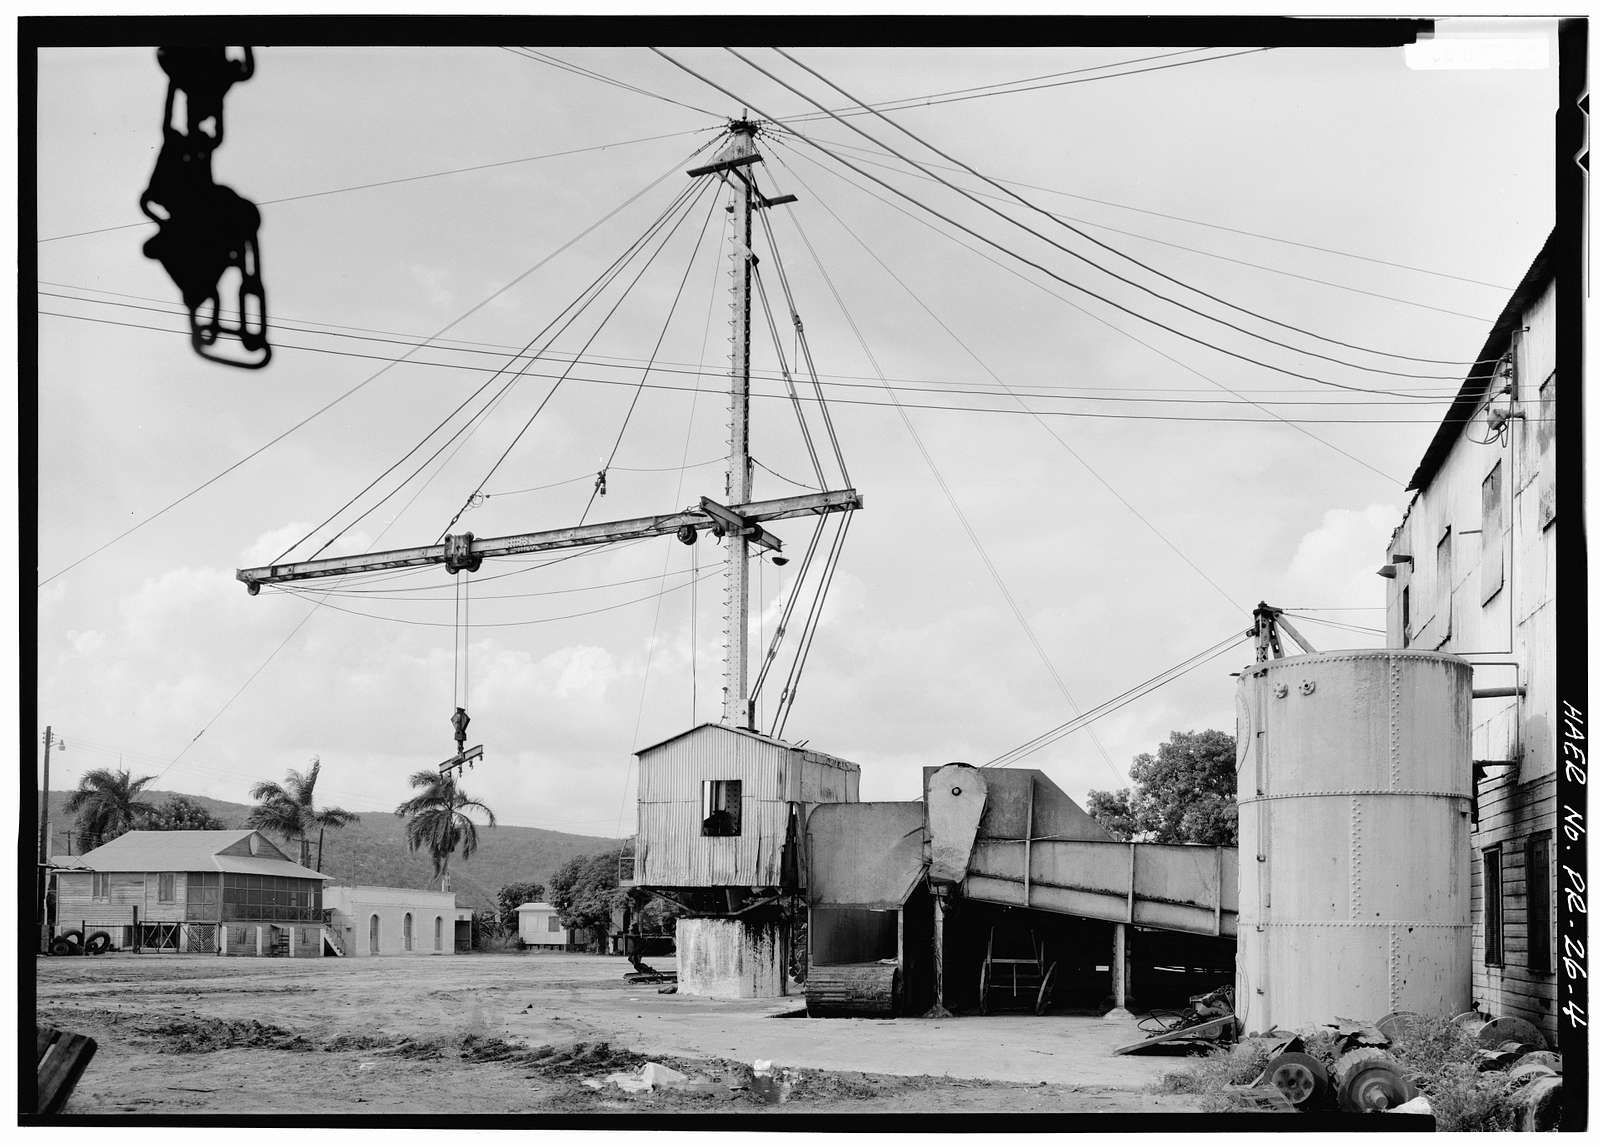 San Francisco Sugar Central, Indios, Guayanilla Municipio, PR